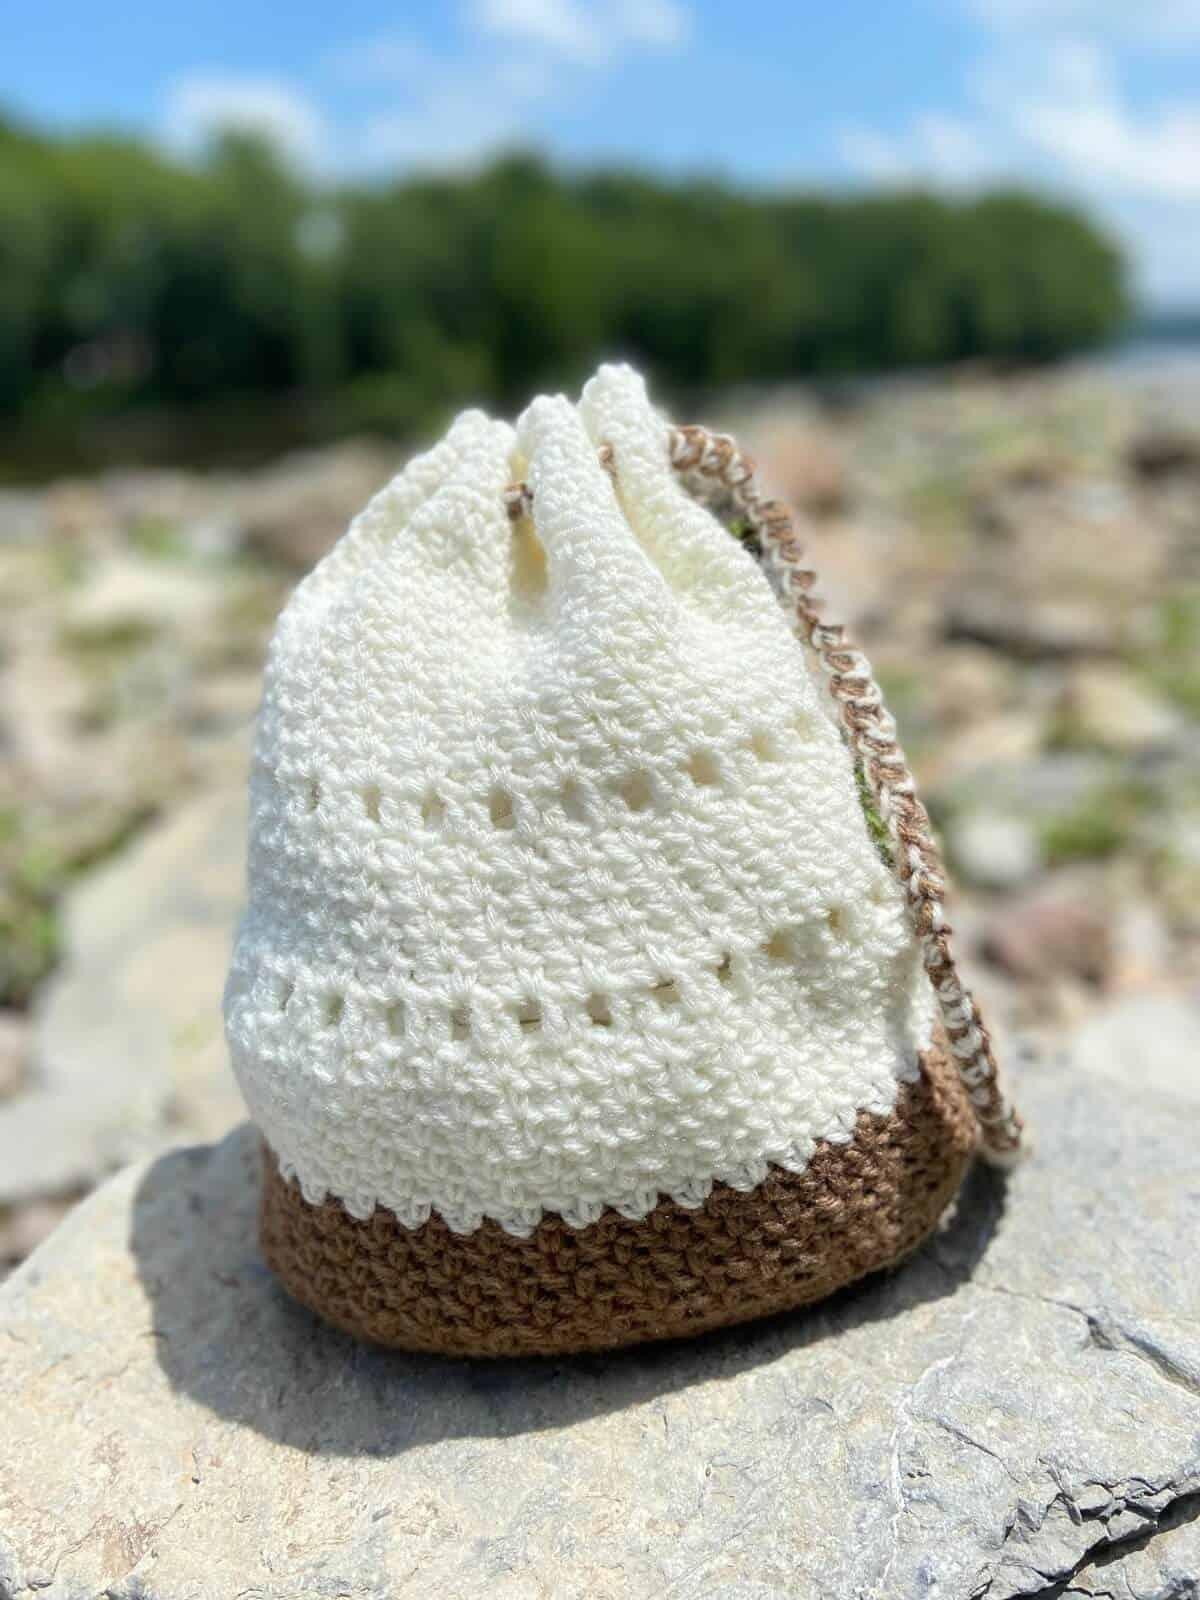 Crochet Drawstring Bag (Photo by Viana Boenzli)